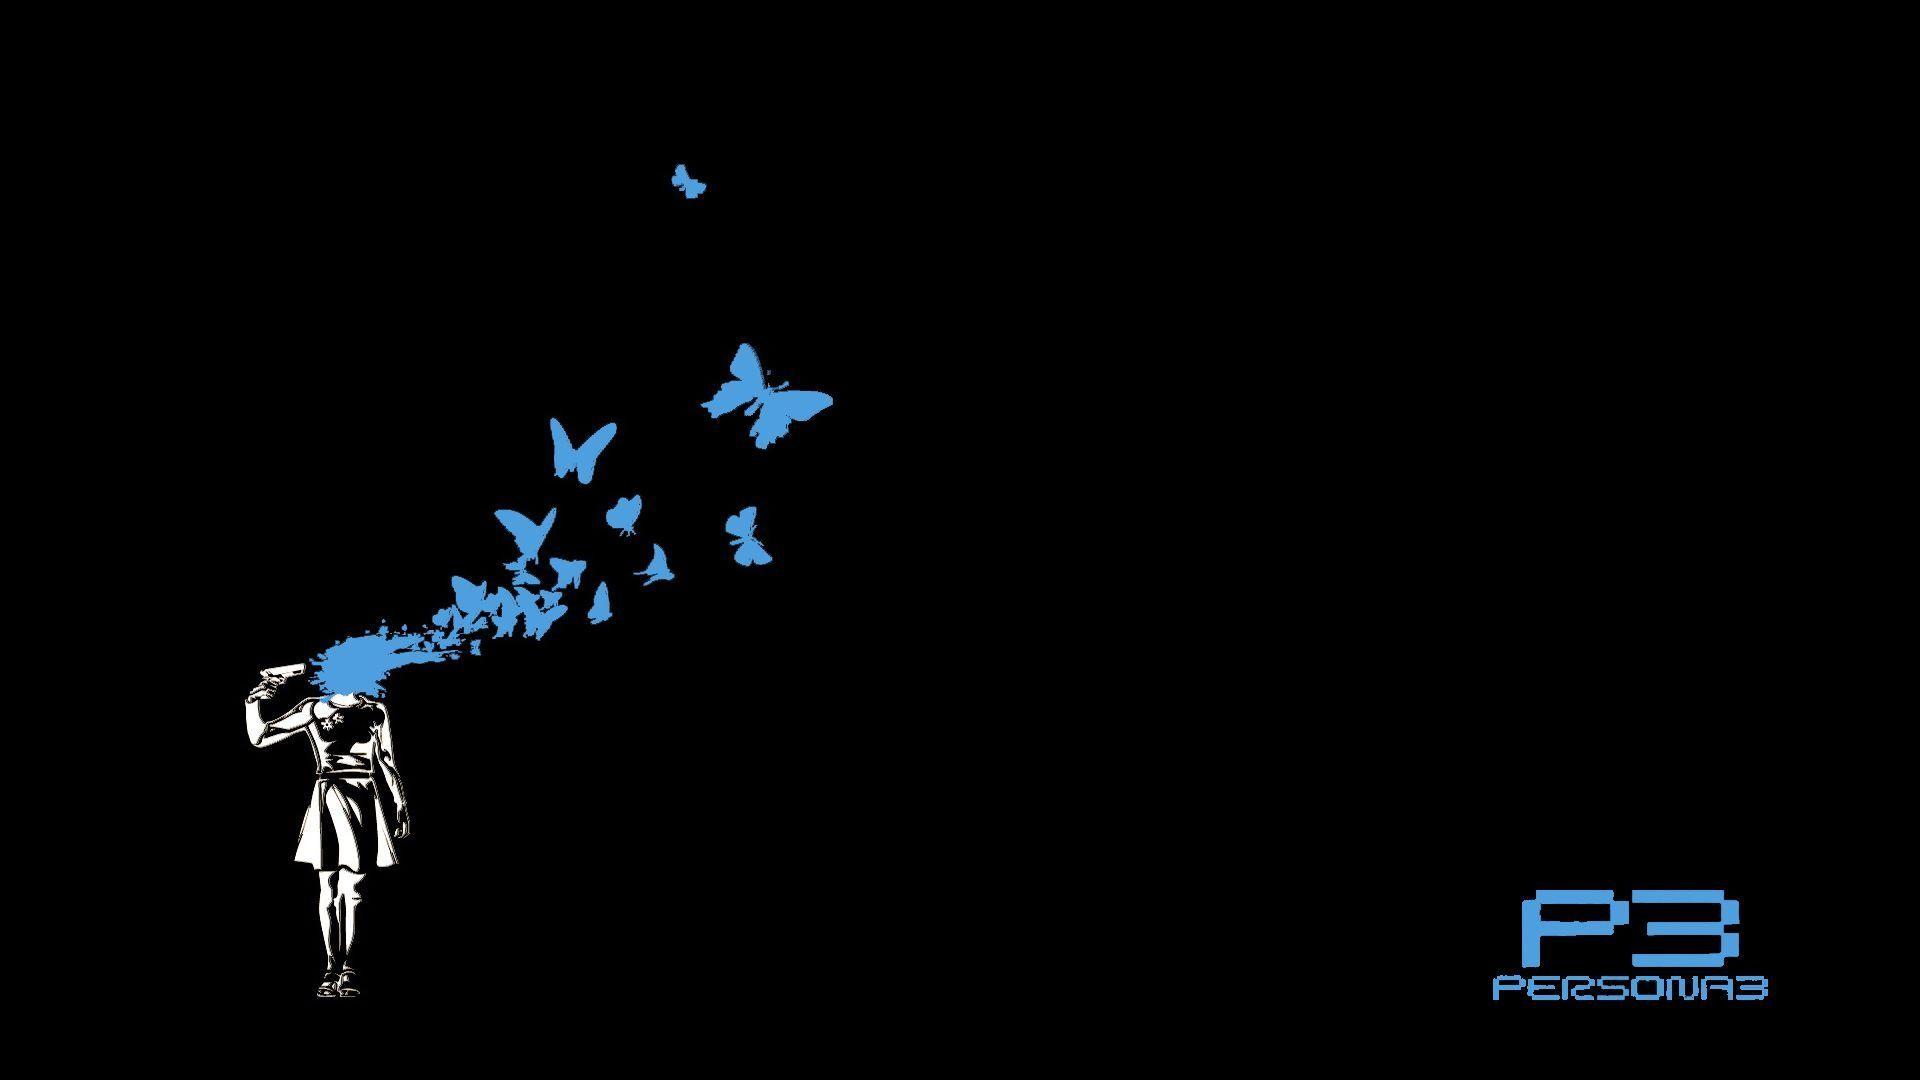 Persona 3 HD Wallpaper (68+ images)